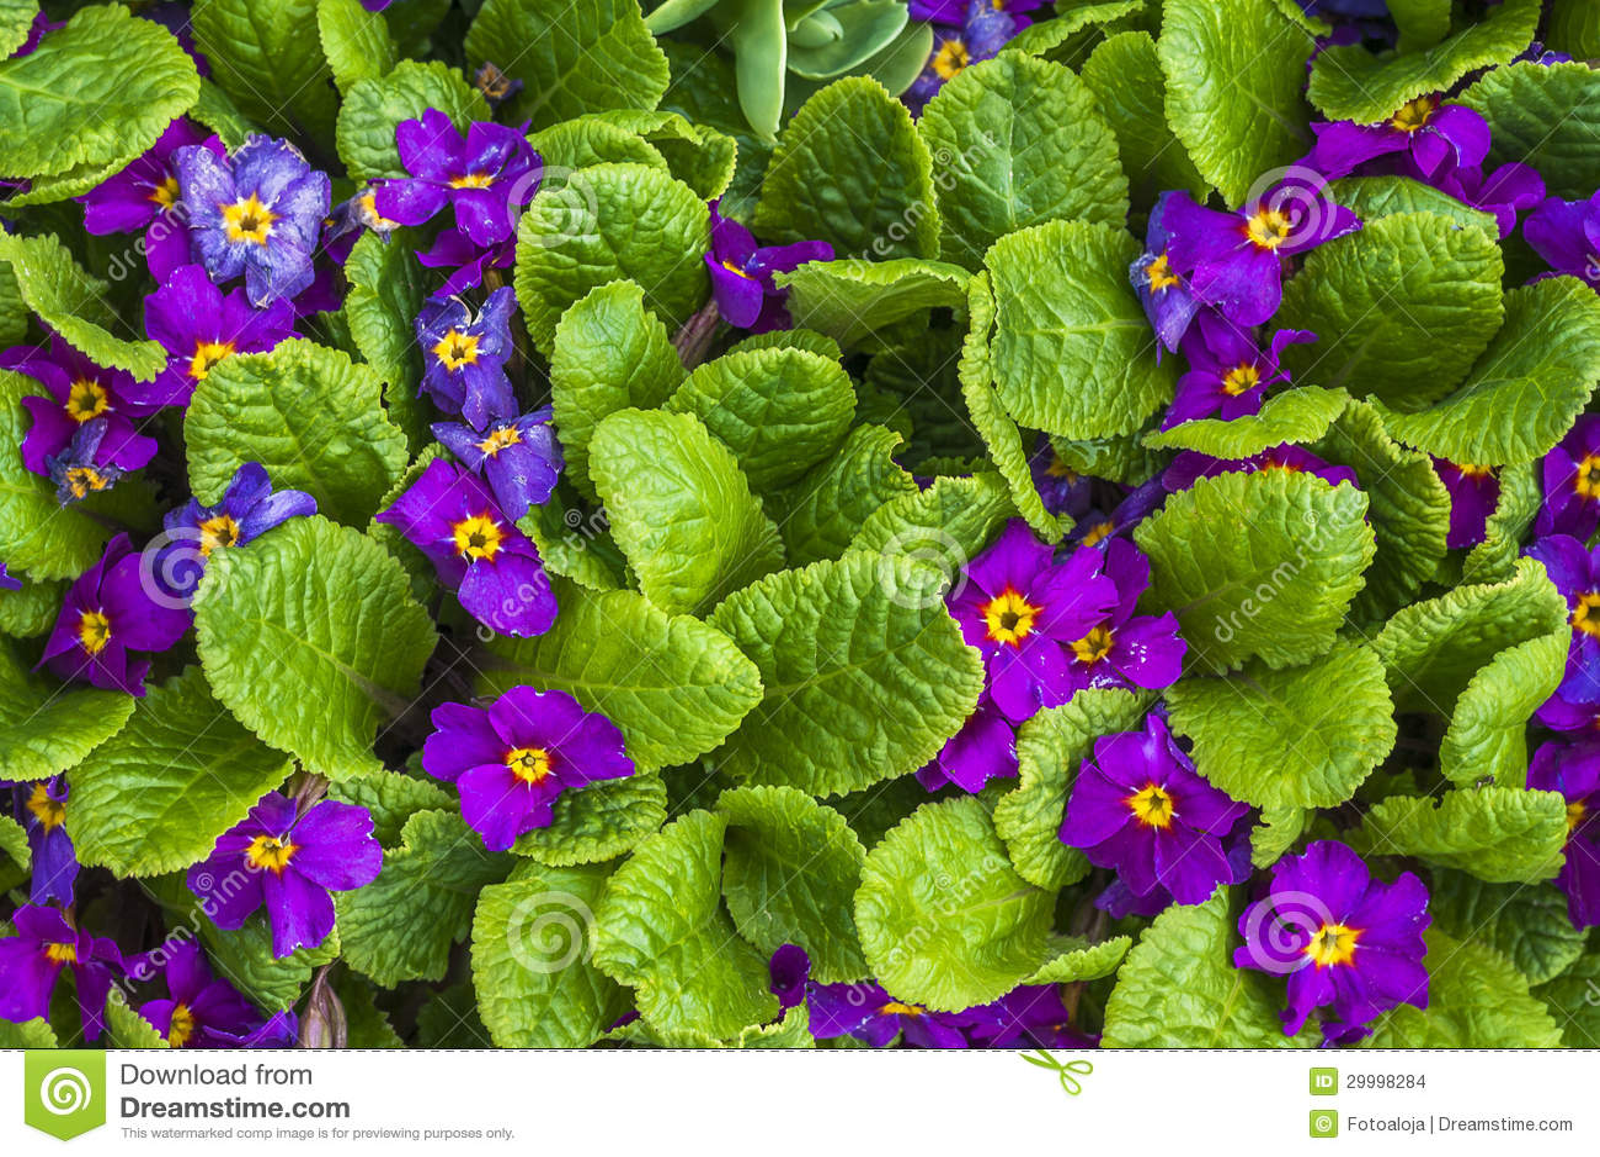 Flower floral purple tiny spring plants nature stock photo image royalty free stock photo mightylinksfo